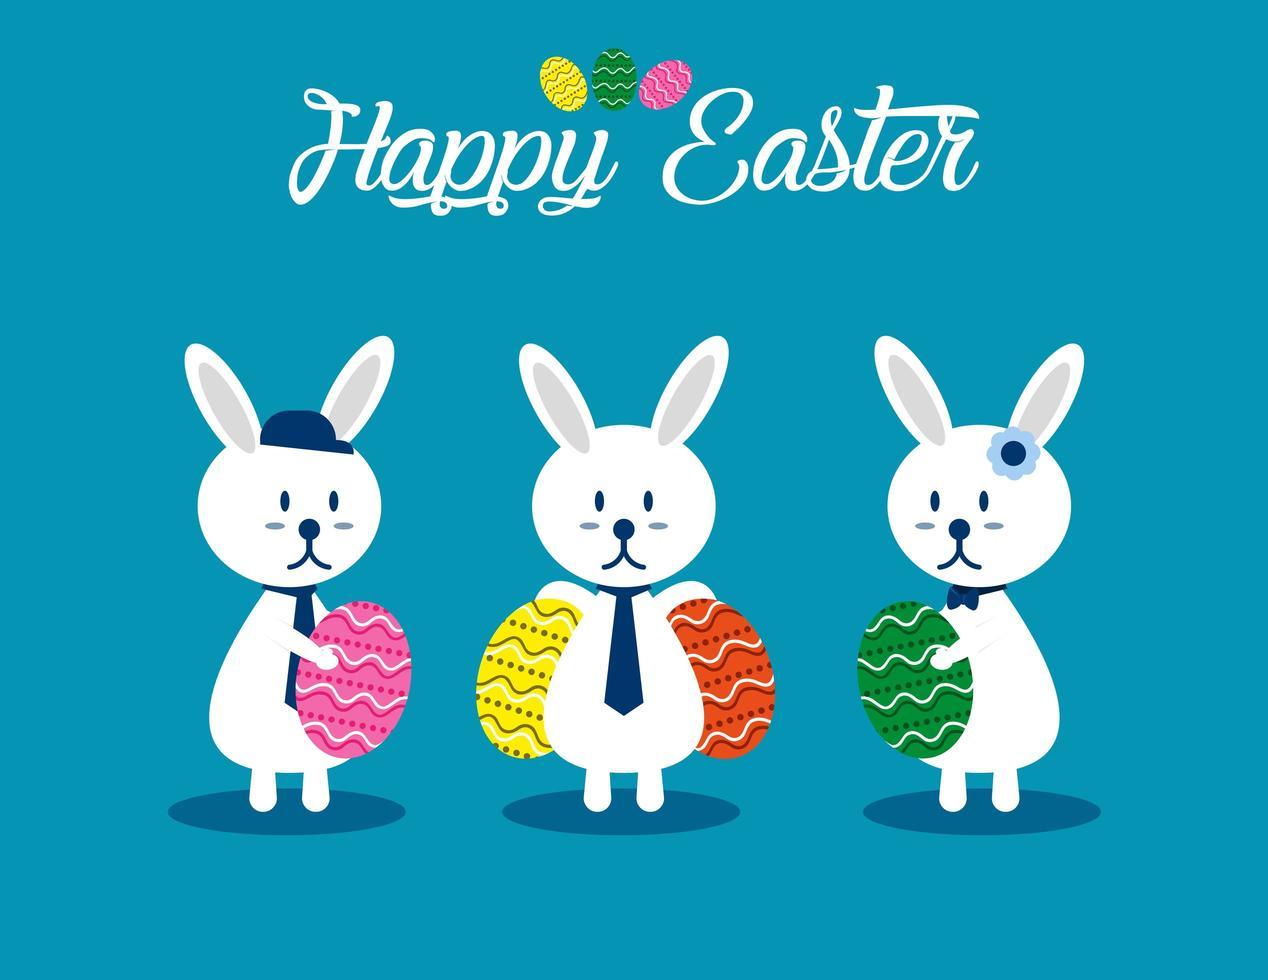 Easter Bunnies Holding Eggs Set vector